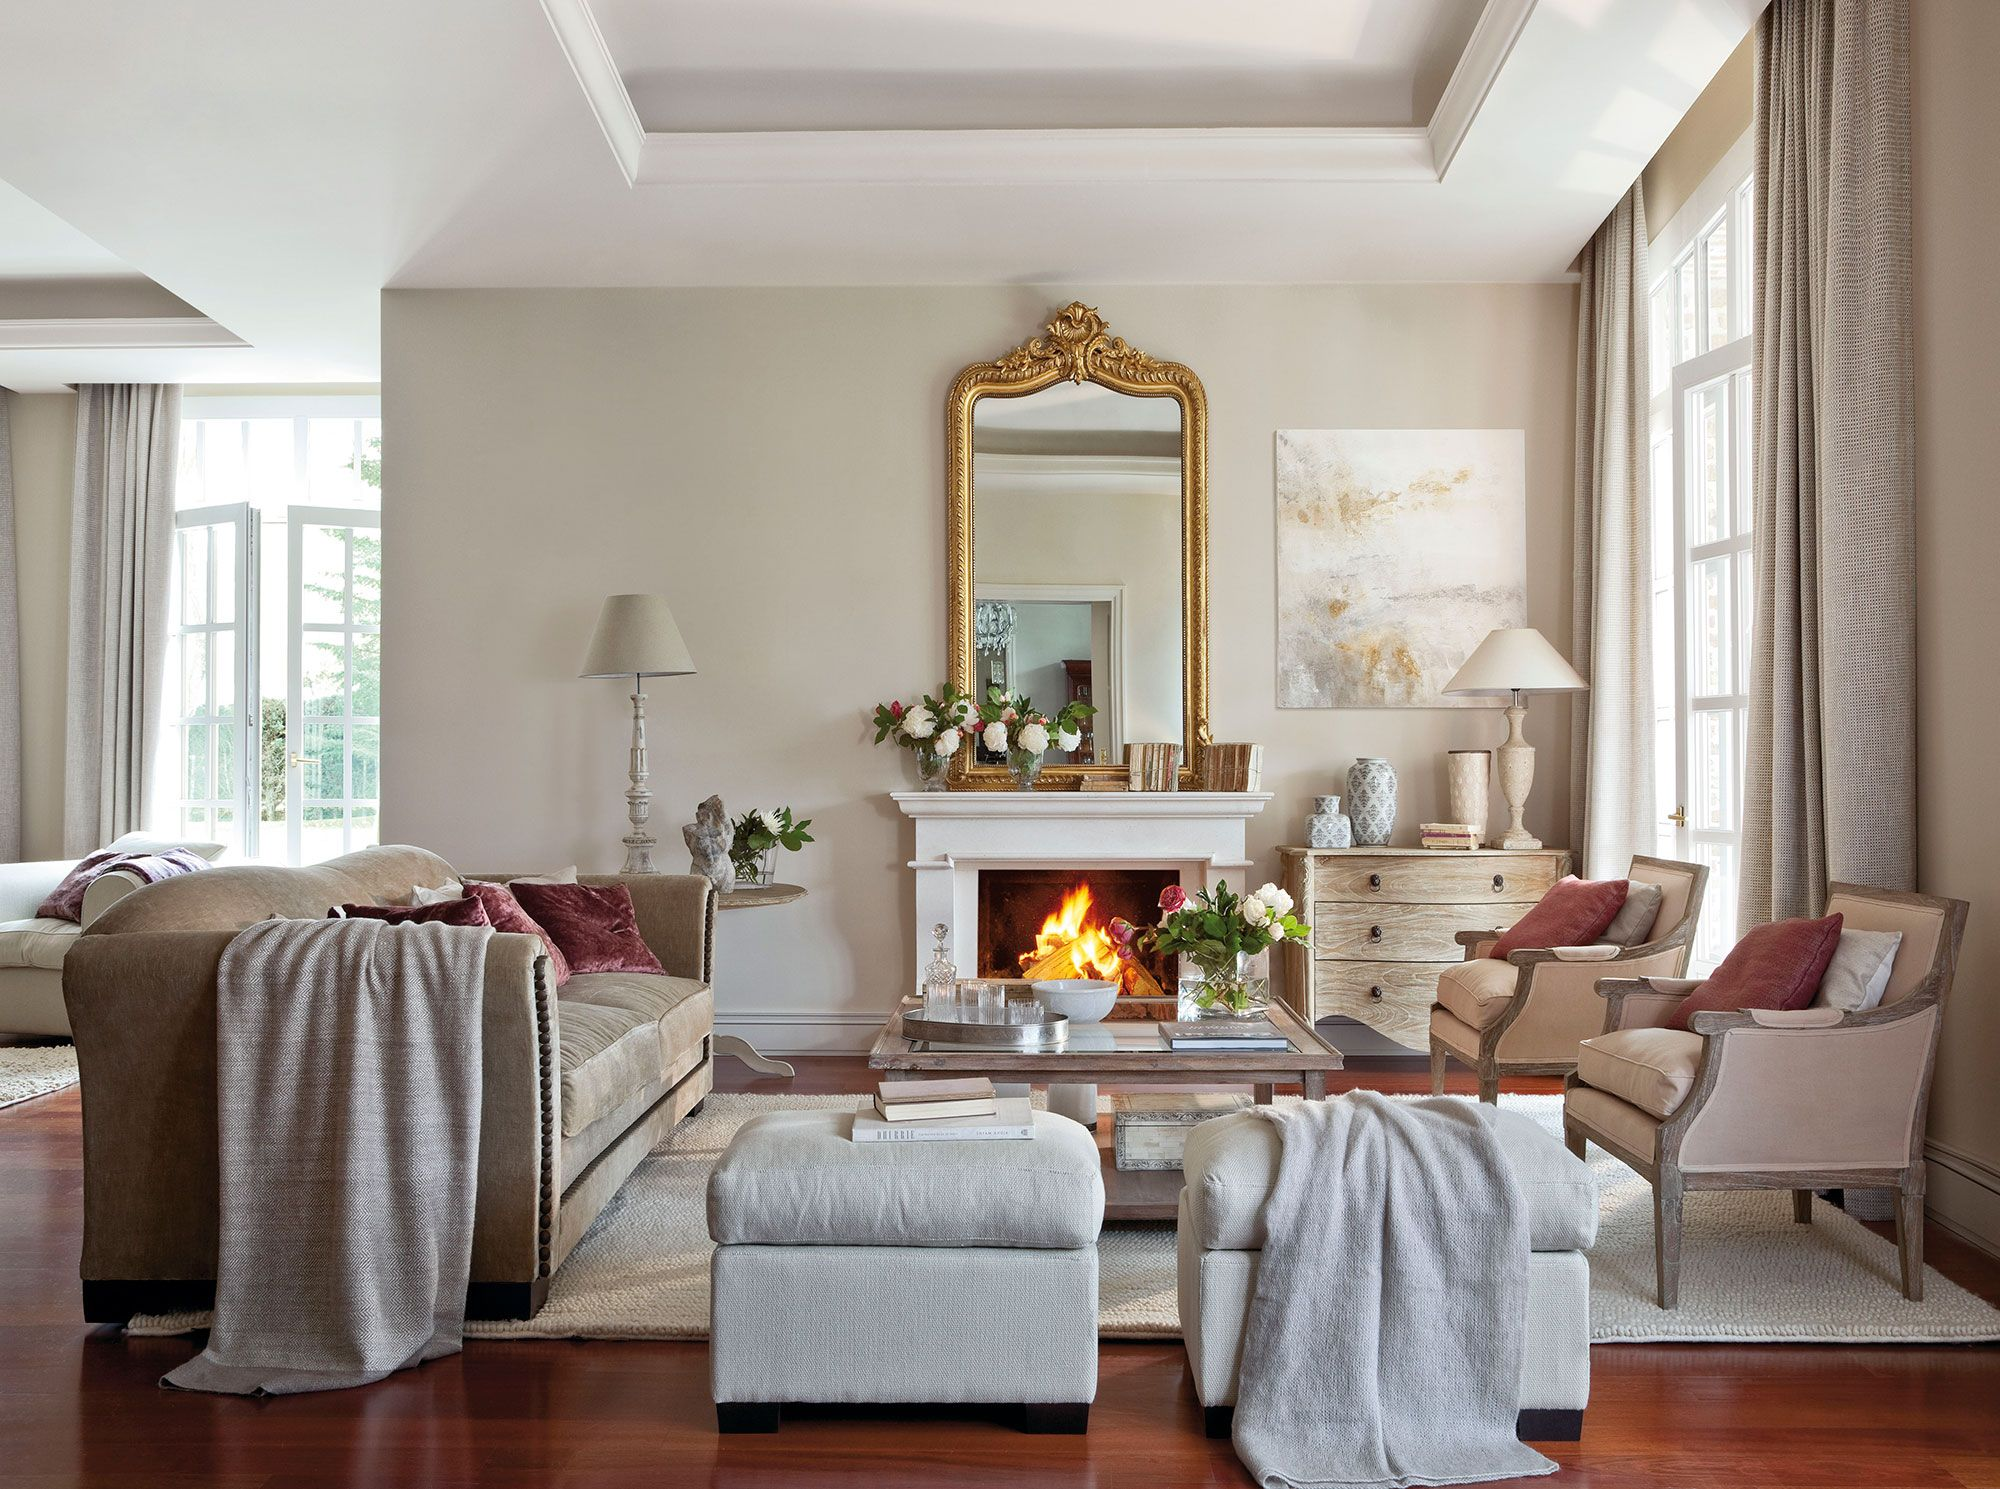 Sal n con chimenea y espejo con moldura dorada for Espejos decorativos para chimeneas